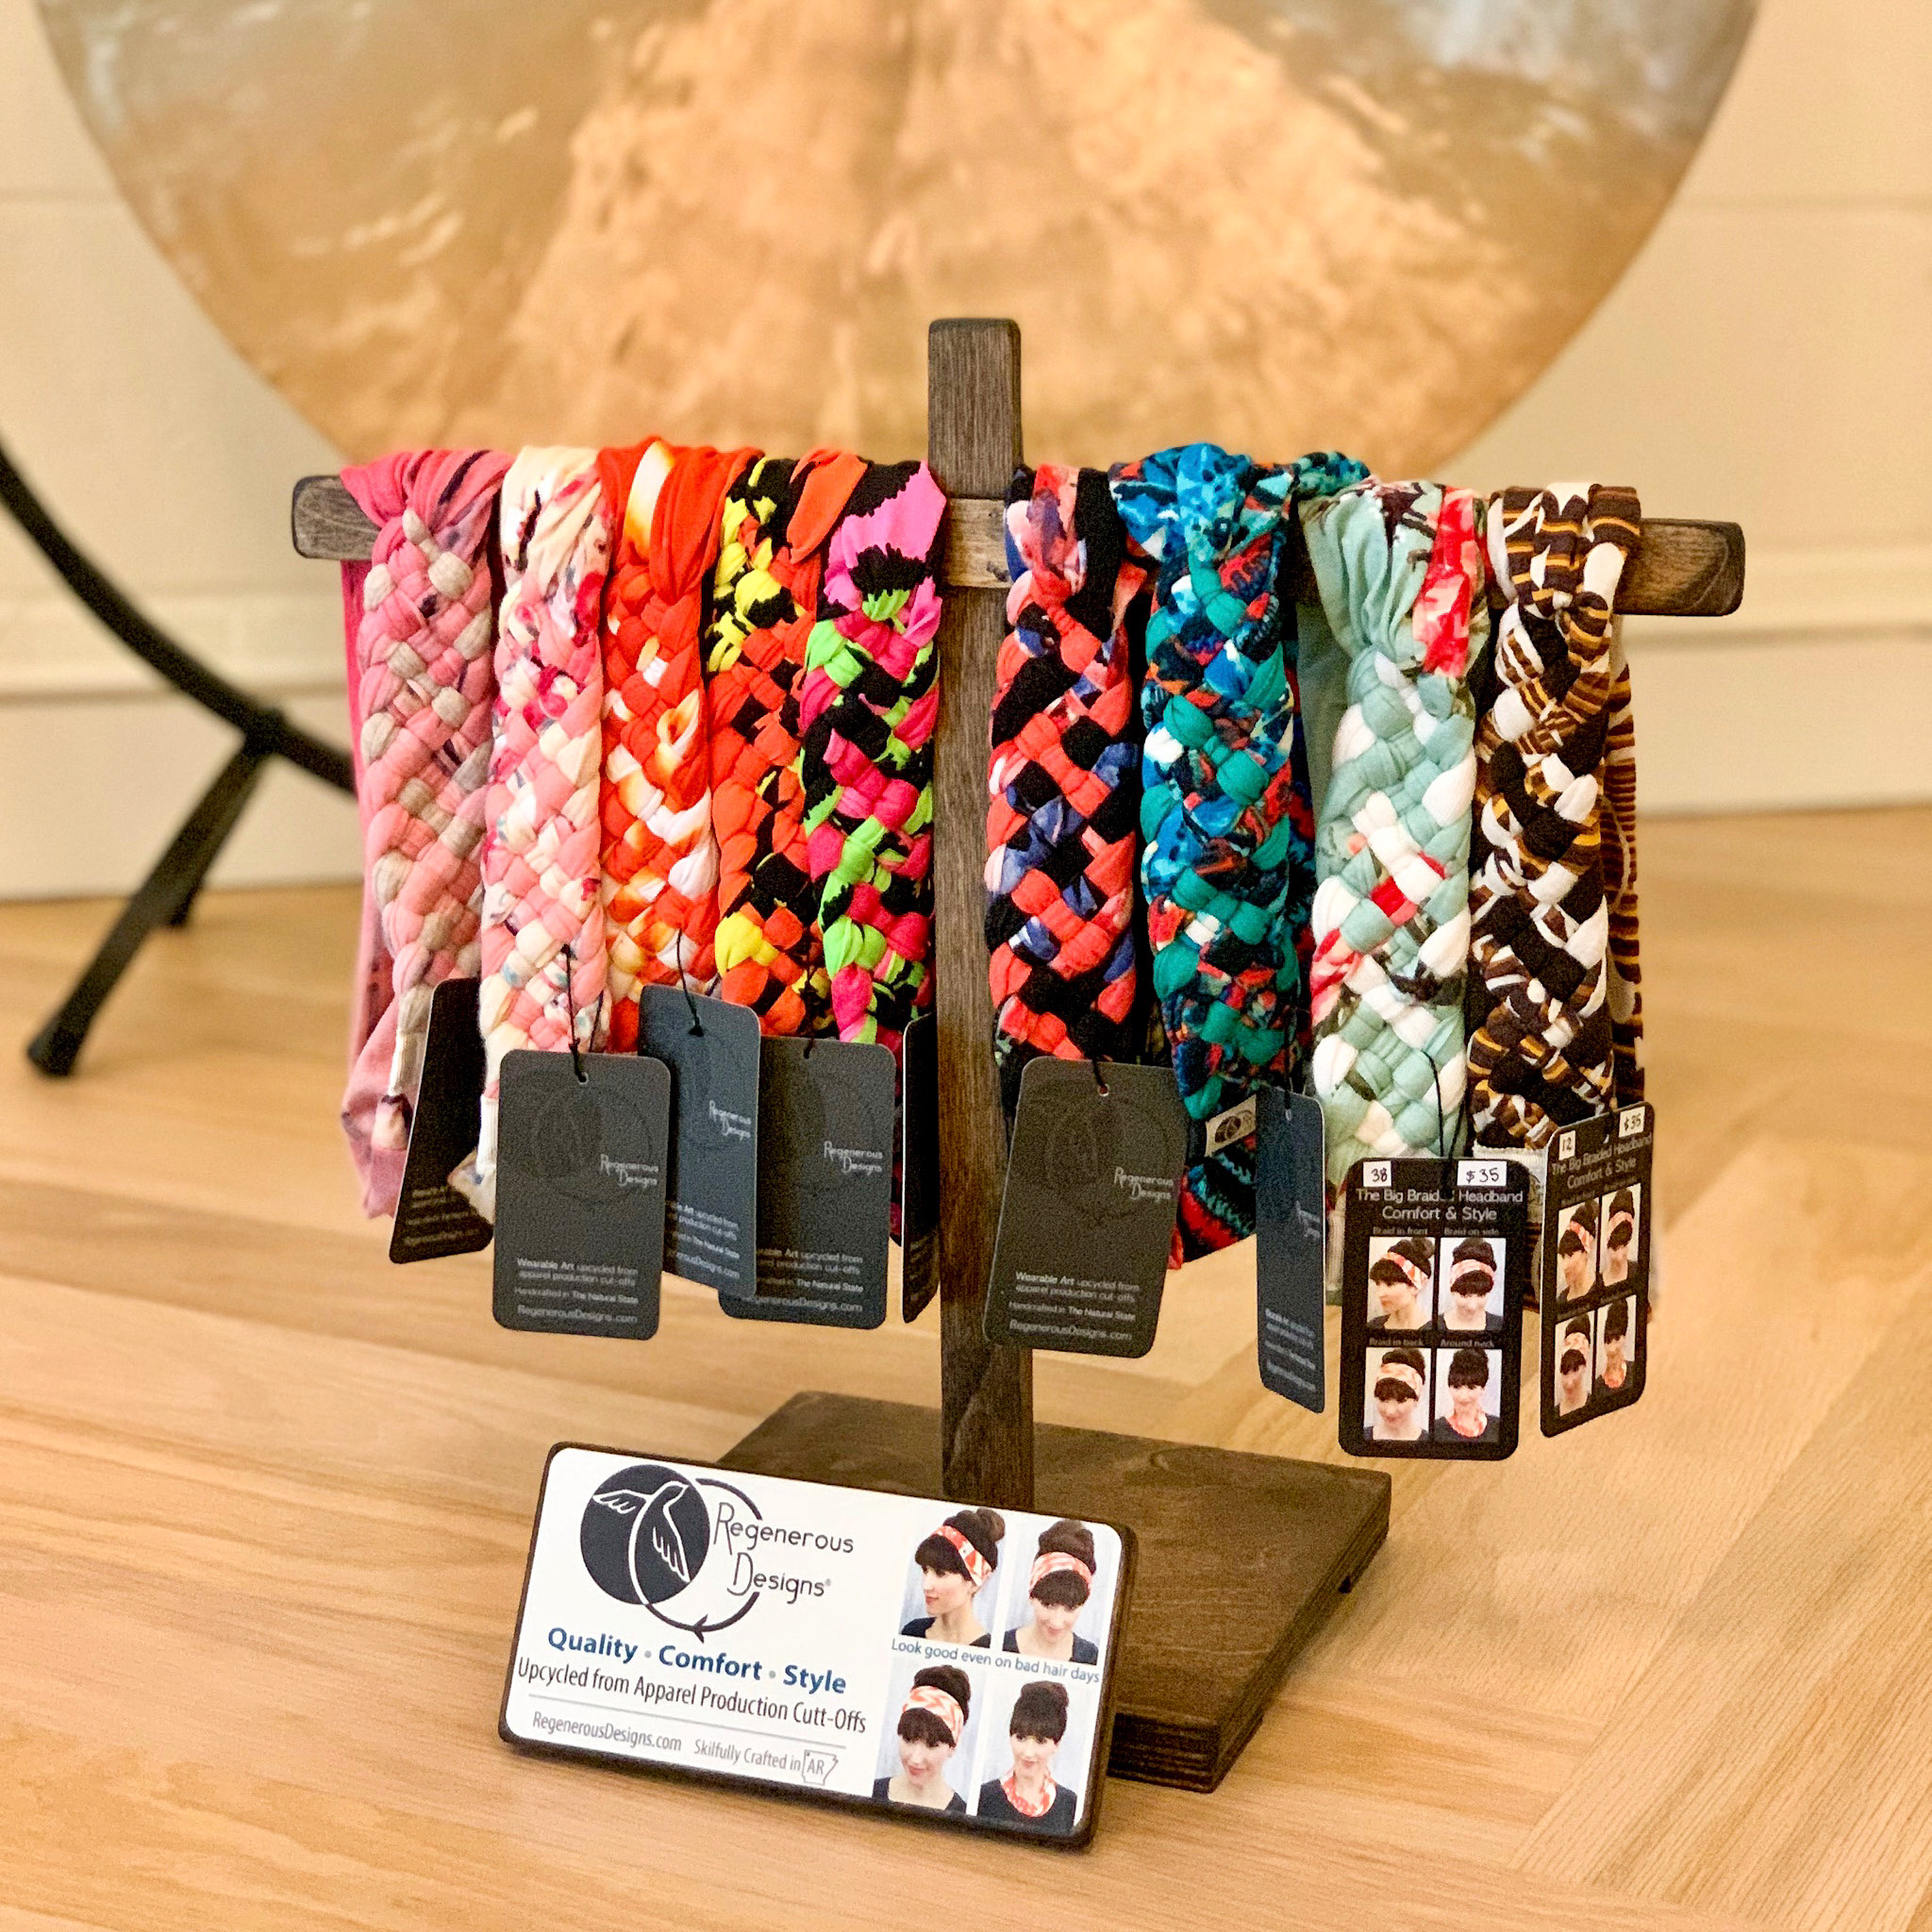 Regenerous Designs Big Braided Headbands at the Cocoon Yoga Studio